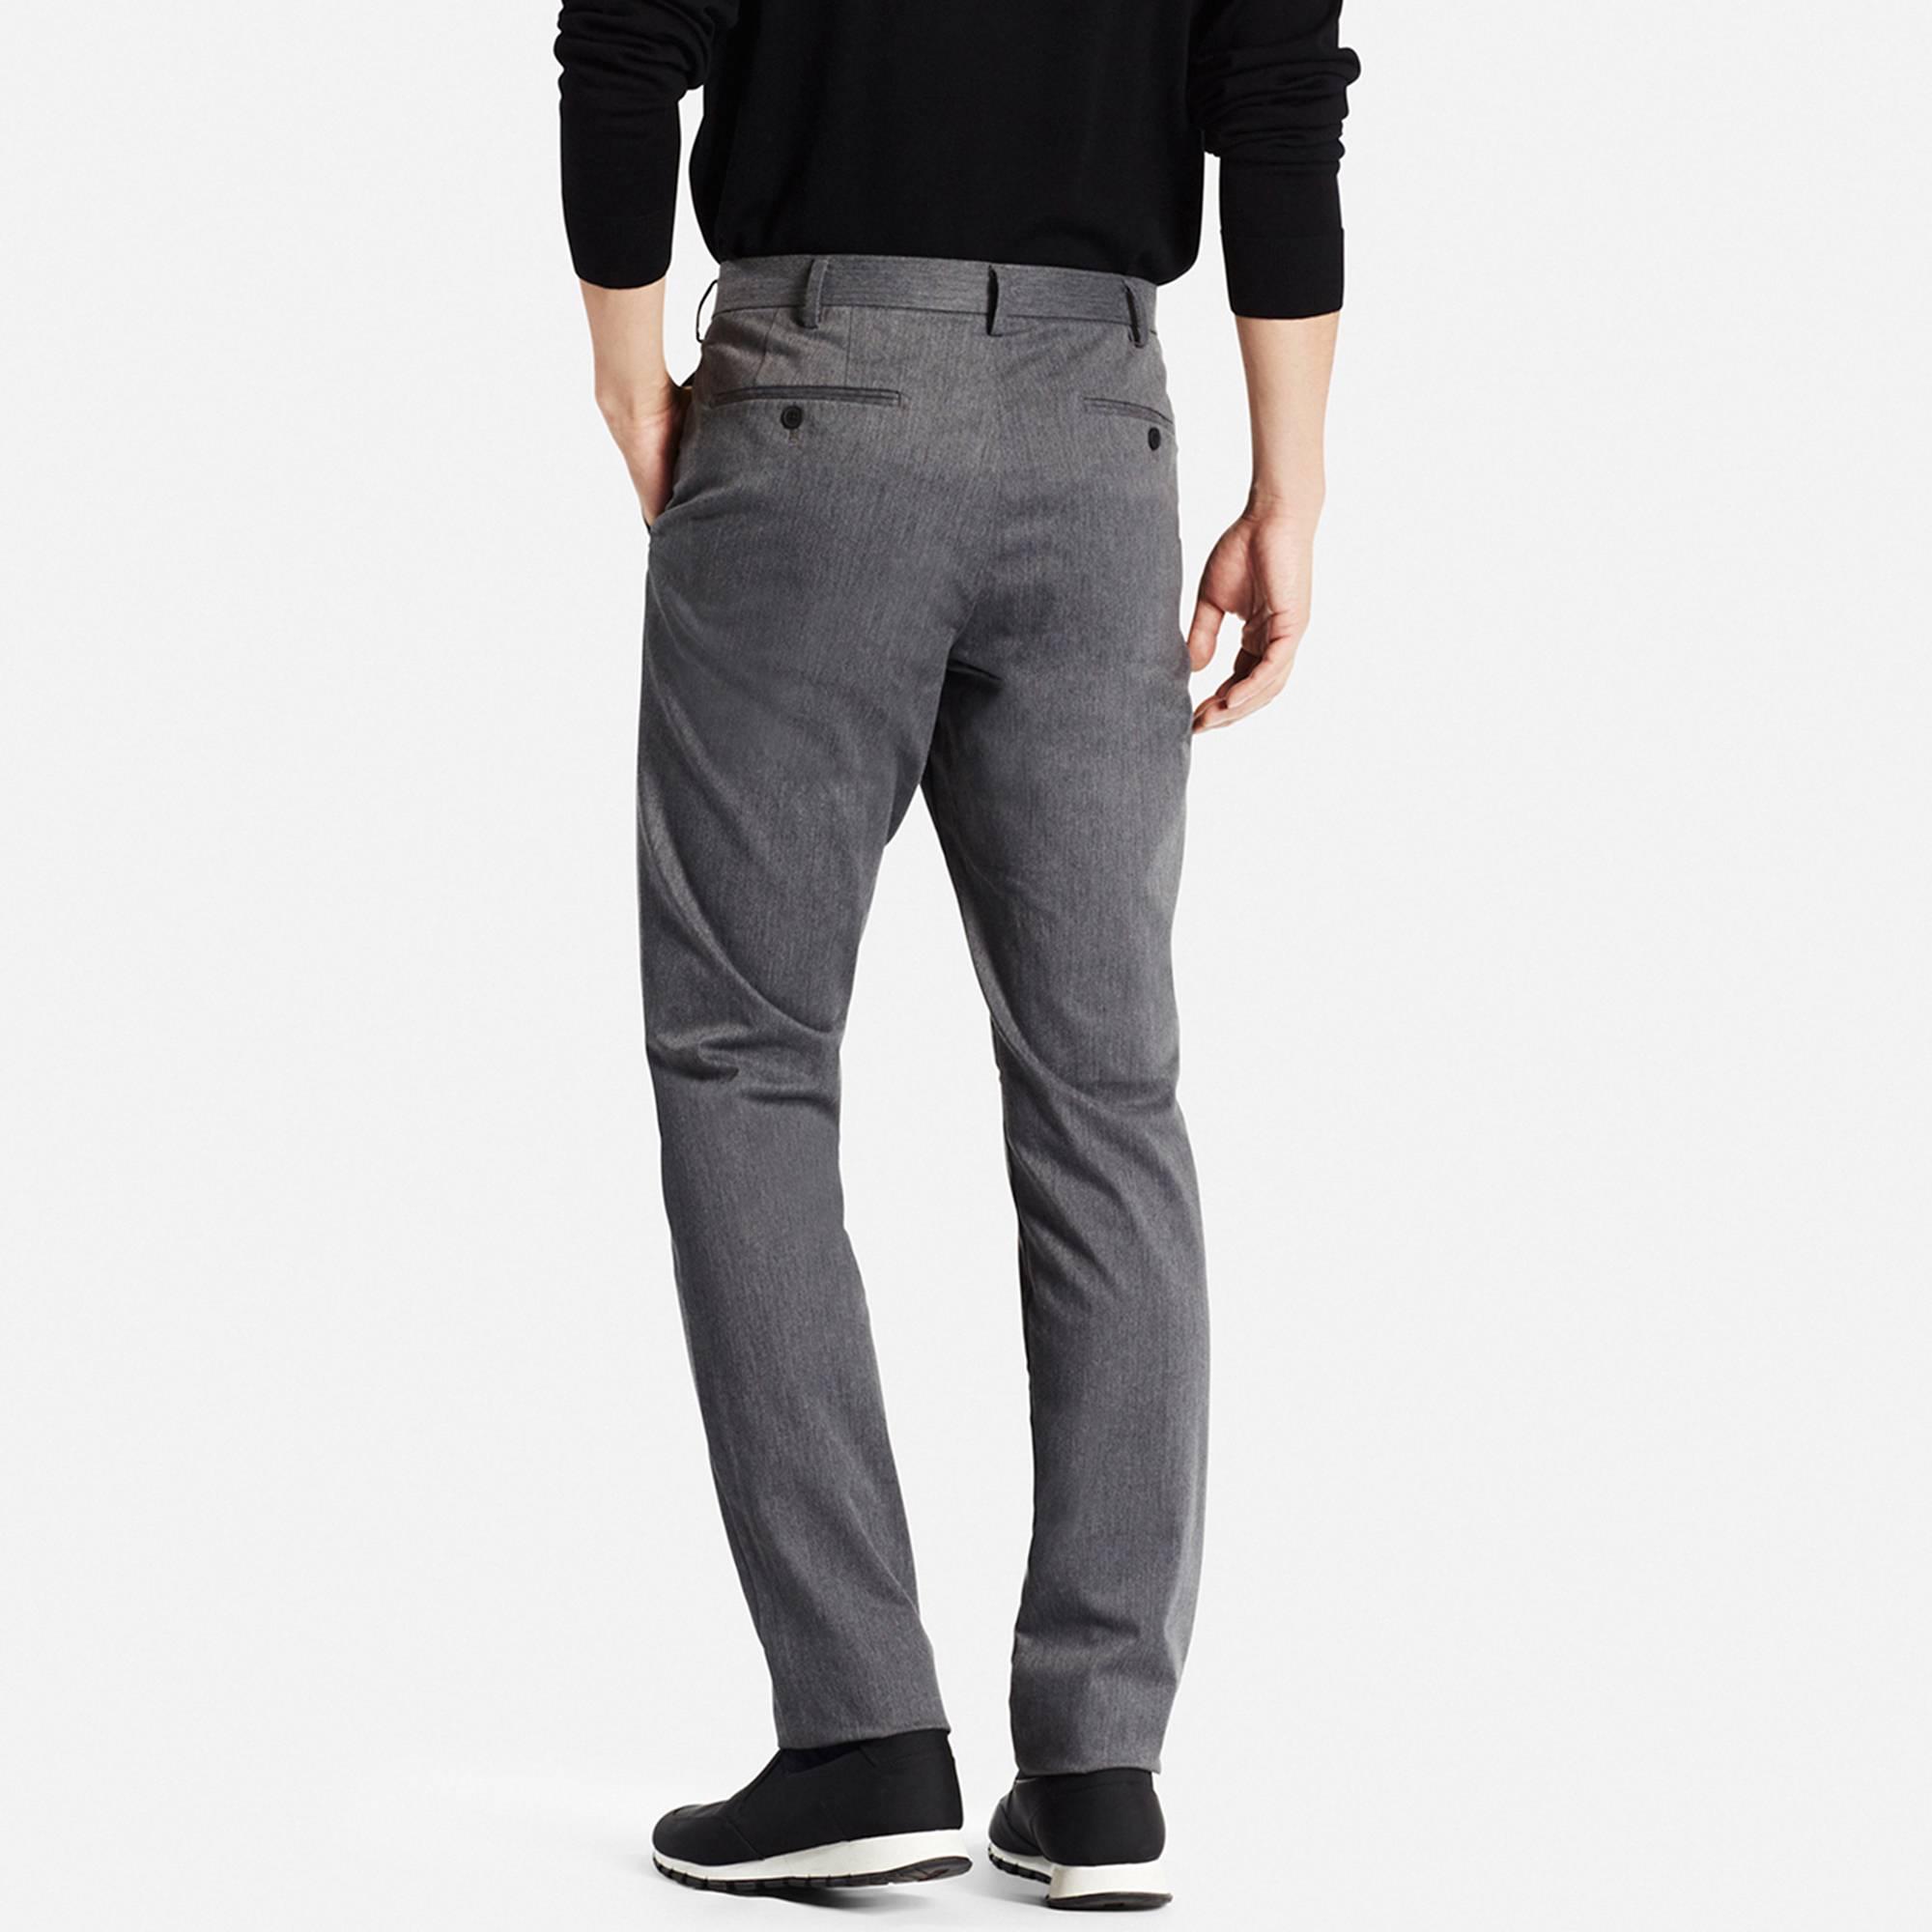 chino jeans men slim fit chino flat front pants, dark gray, small YIUKRRK